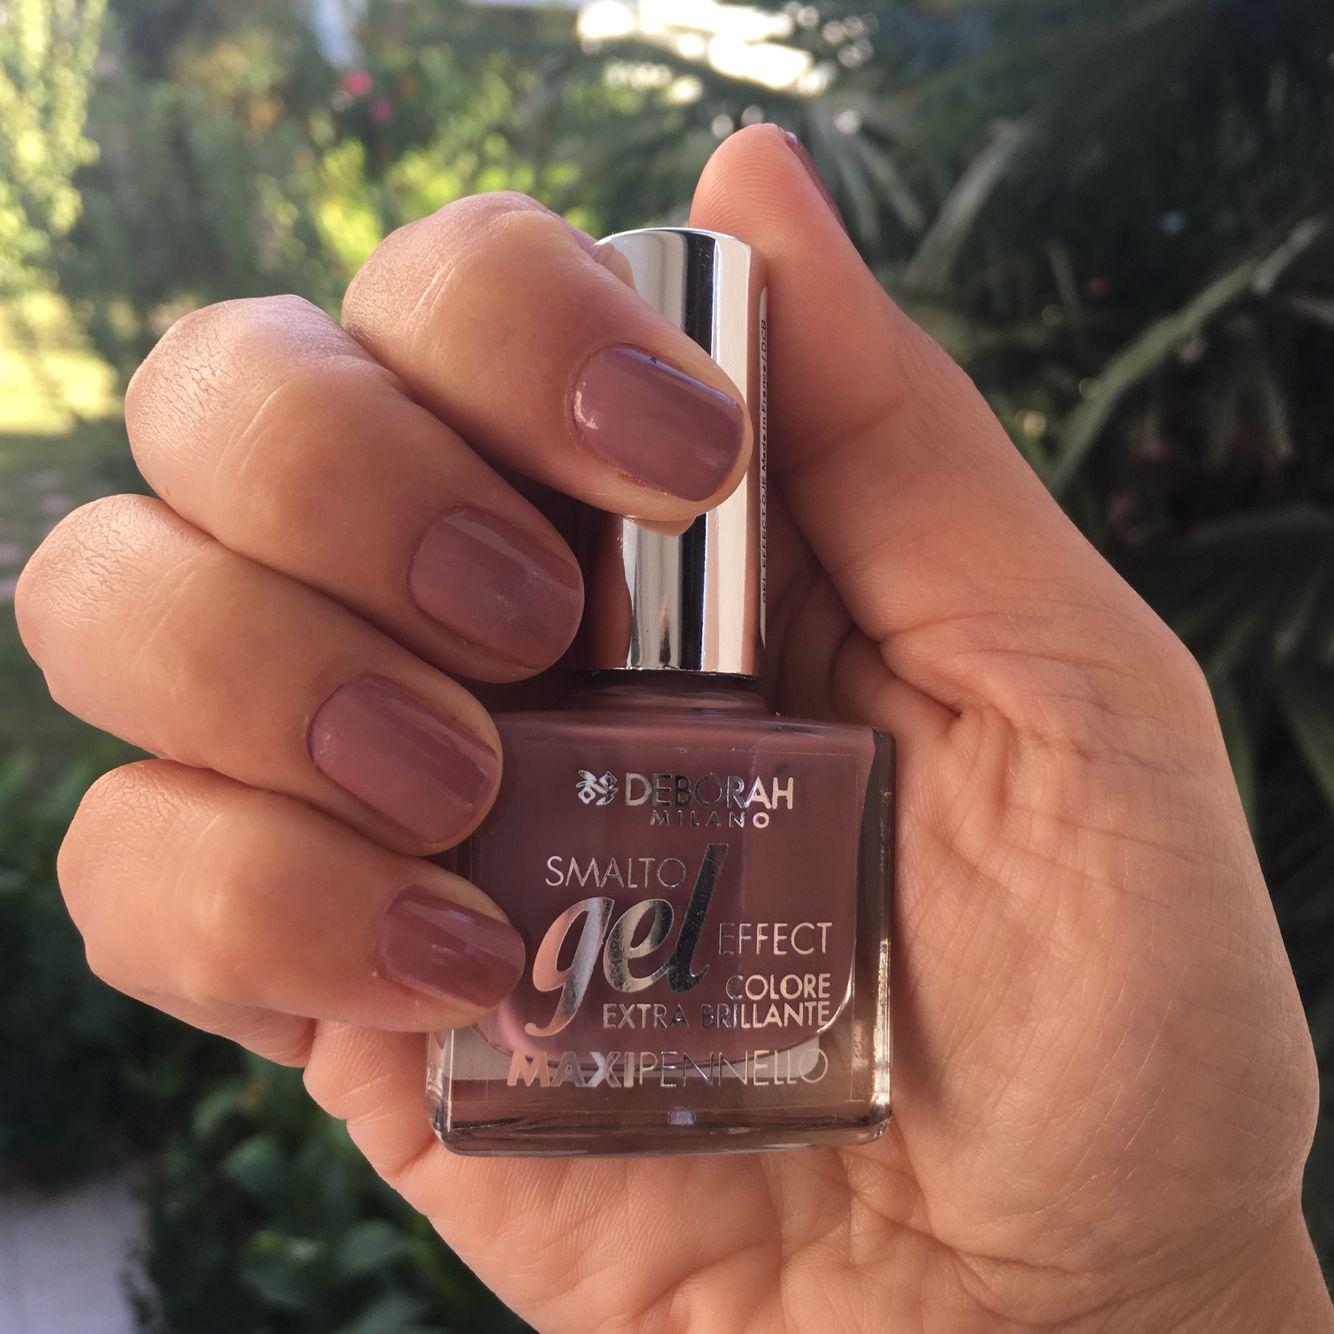 Deborah Milano Gel Effect 03 | My Nail | Pinterest